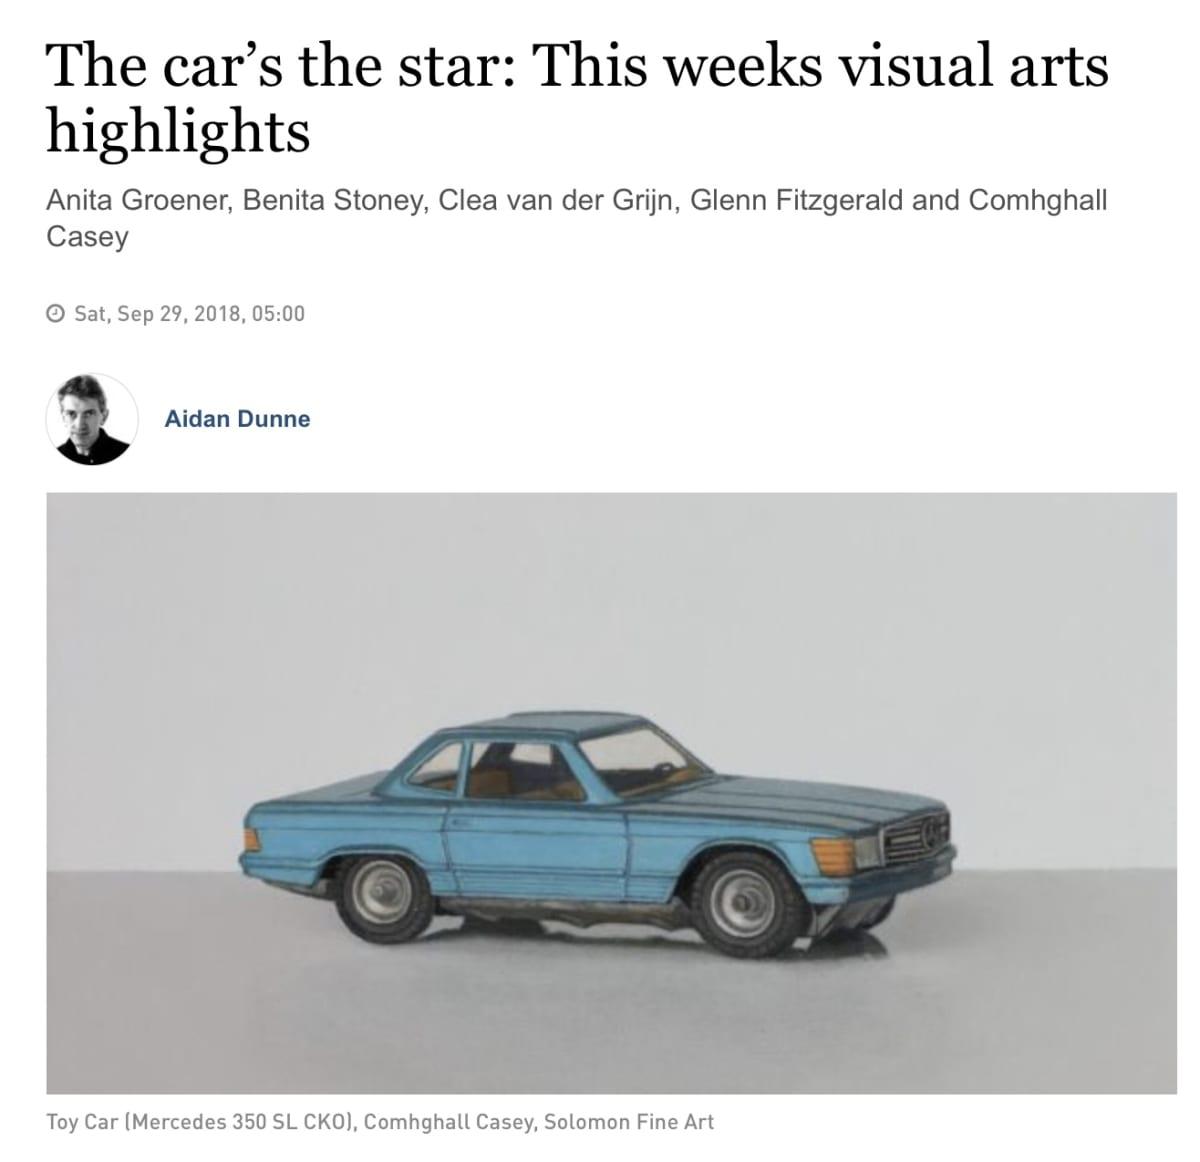 The Car's the Star